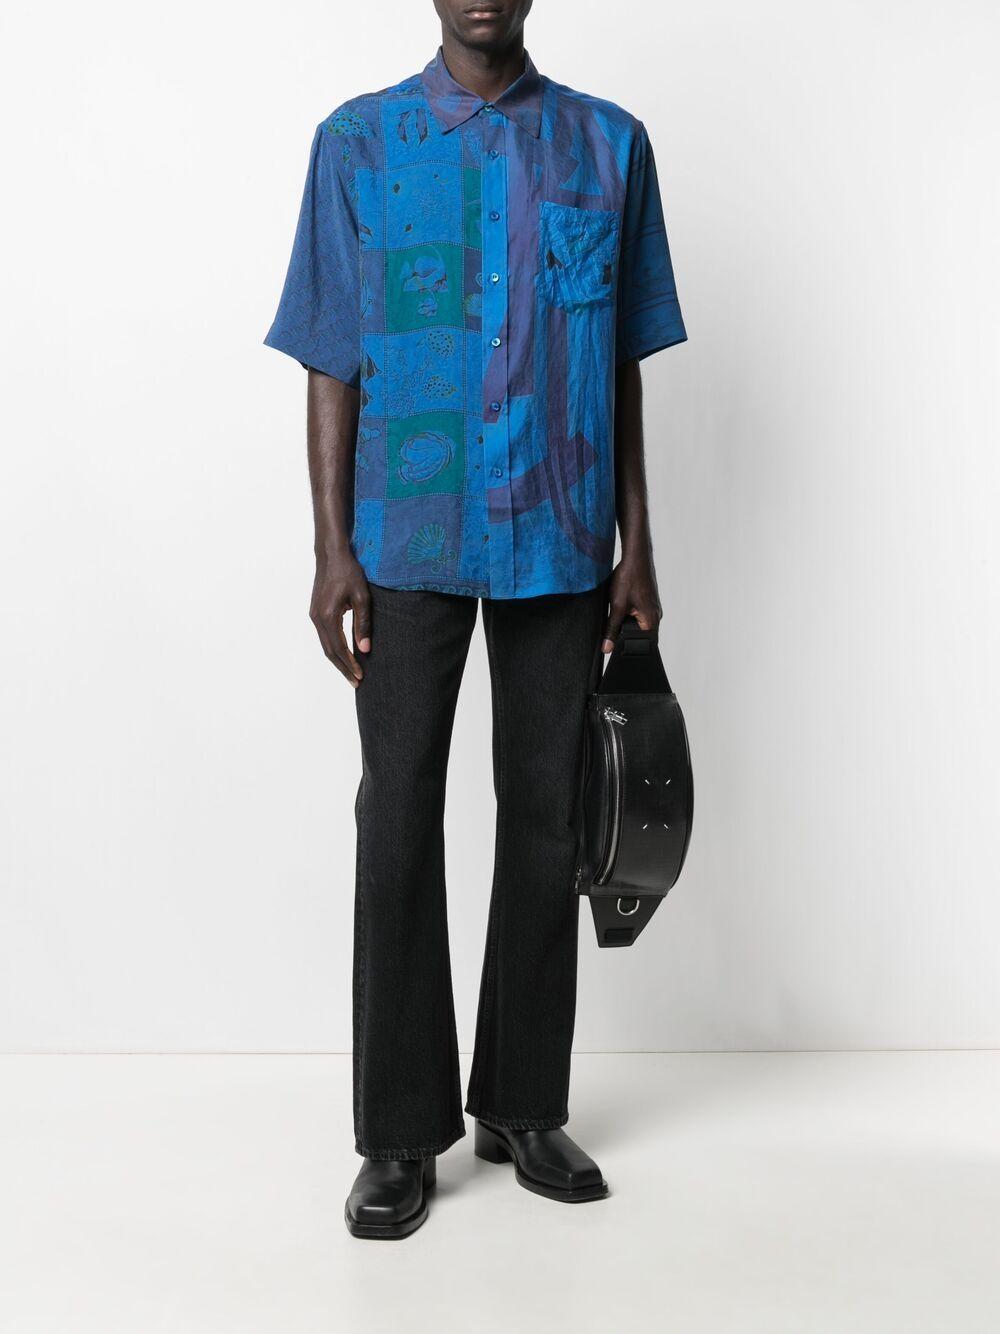 Marine Serre camicia con foular in seta uomo blu MARINE SERRE | Camicie | T076SS21XU06